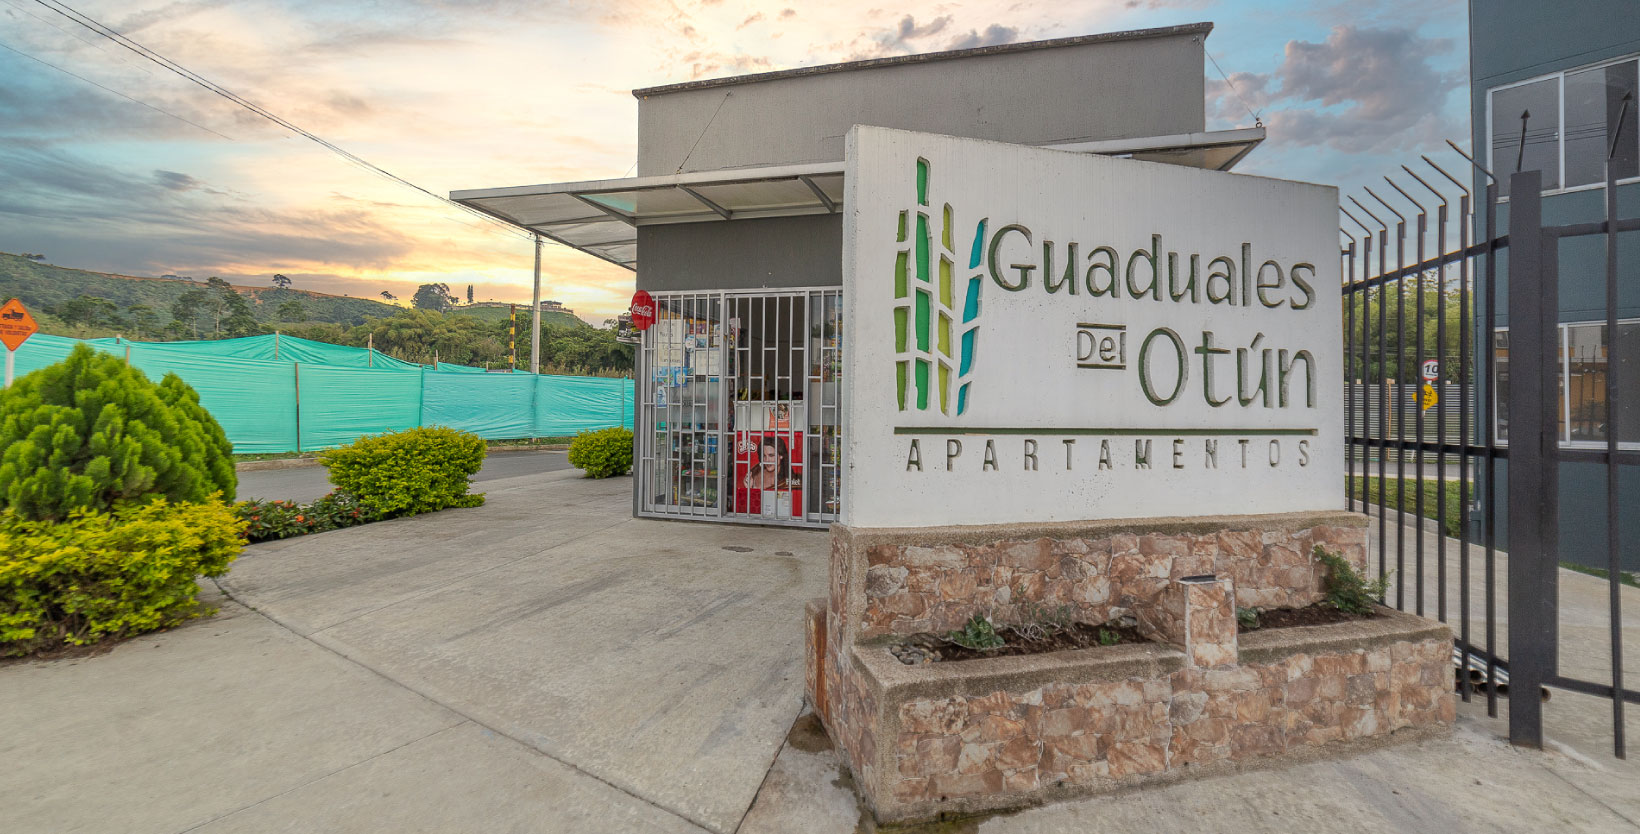 Apartamento_Guaduales_porteria